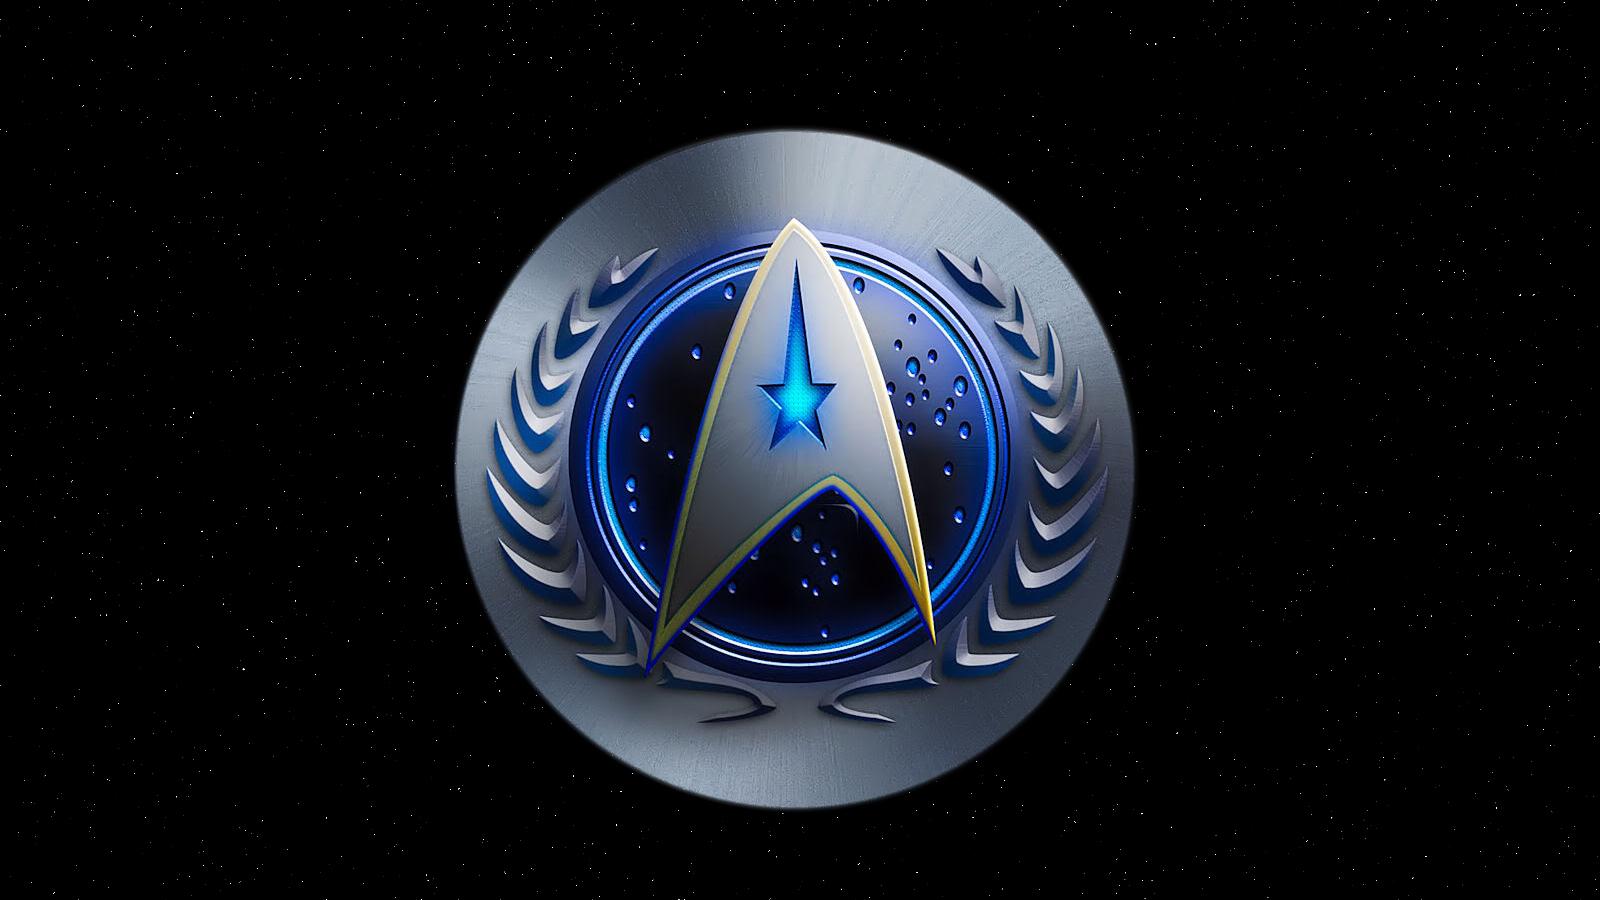 The star trek gallery logos blue prints - Star trek symbol wallpaper ...